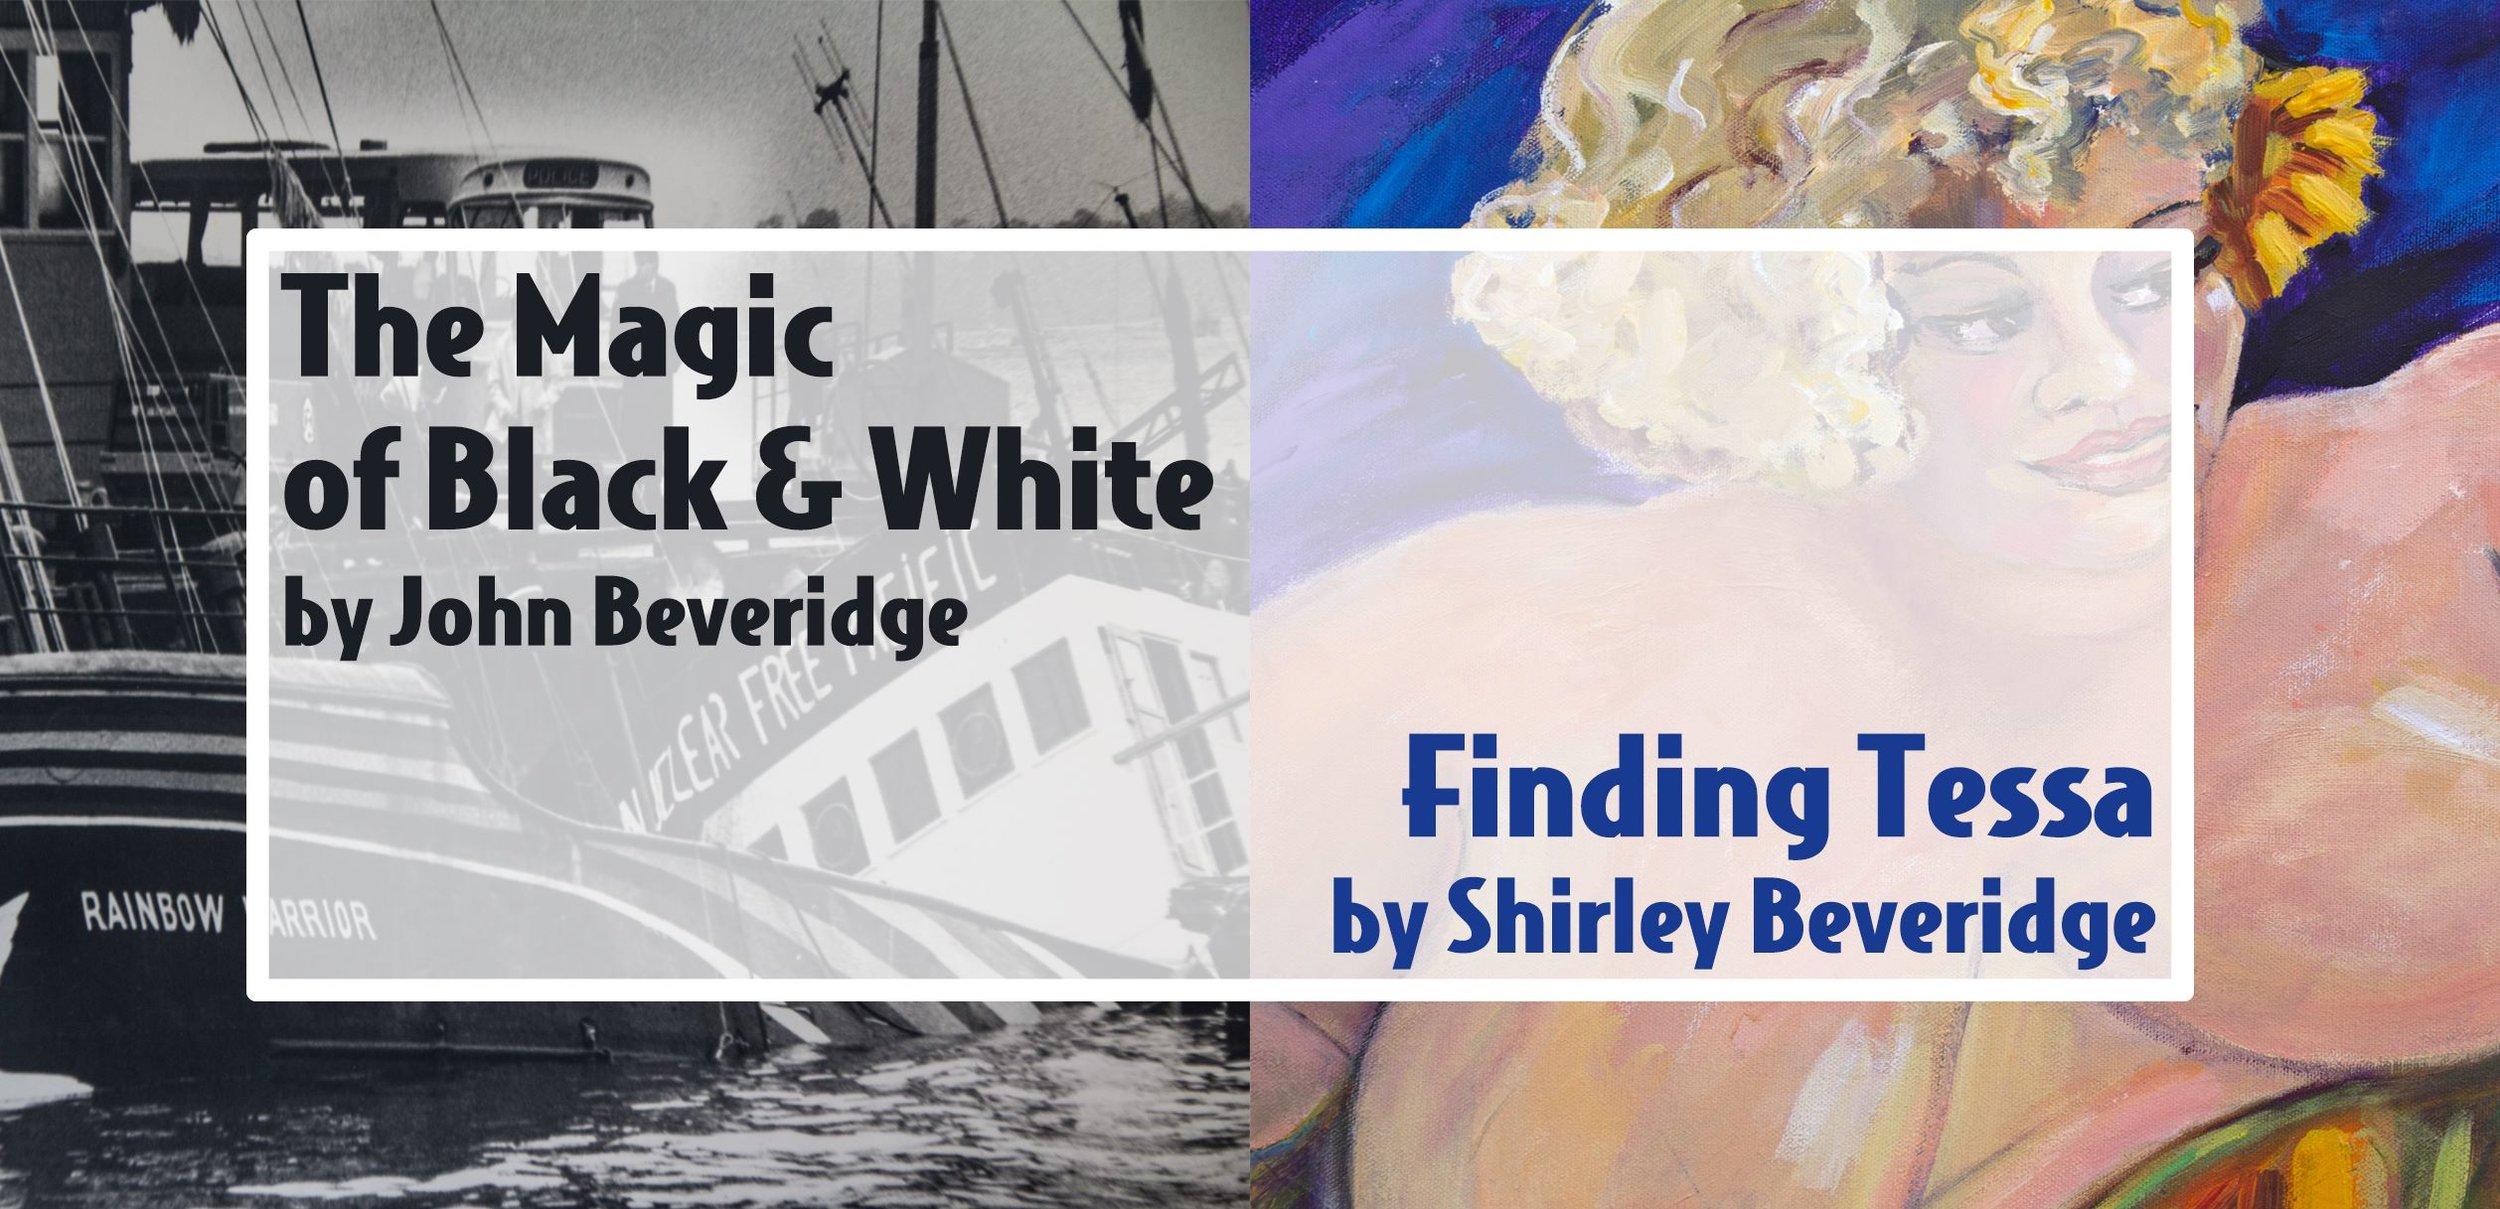 Finding Tessa by Shirley Beveridge and The Magic of Black + White by John Beveridge